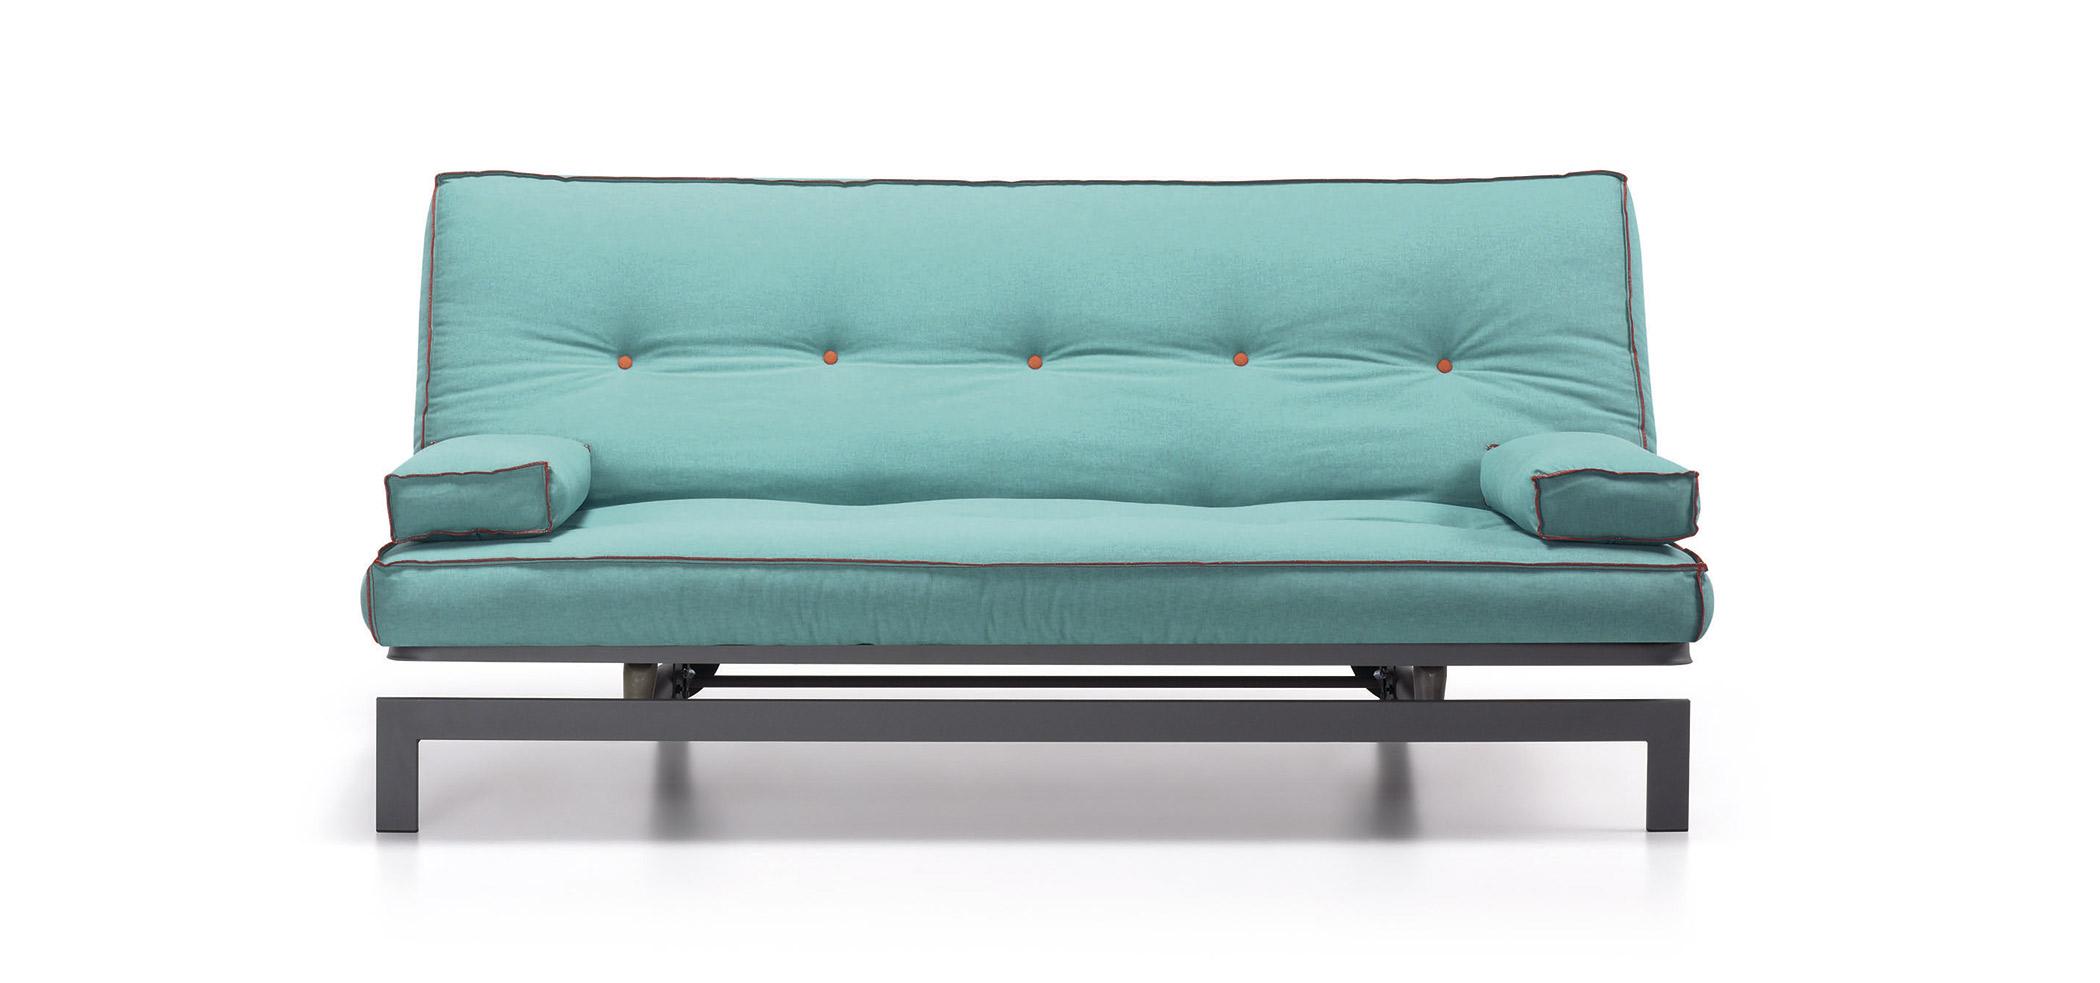 Sof cama turquesa moderno gio no disponible en for Sofa cama turquesa